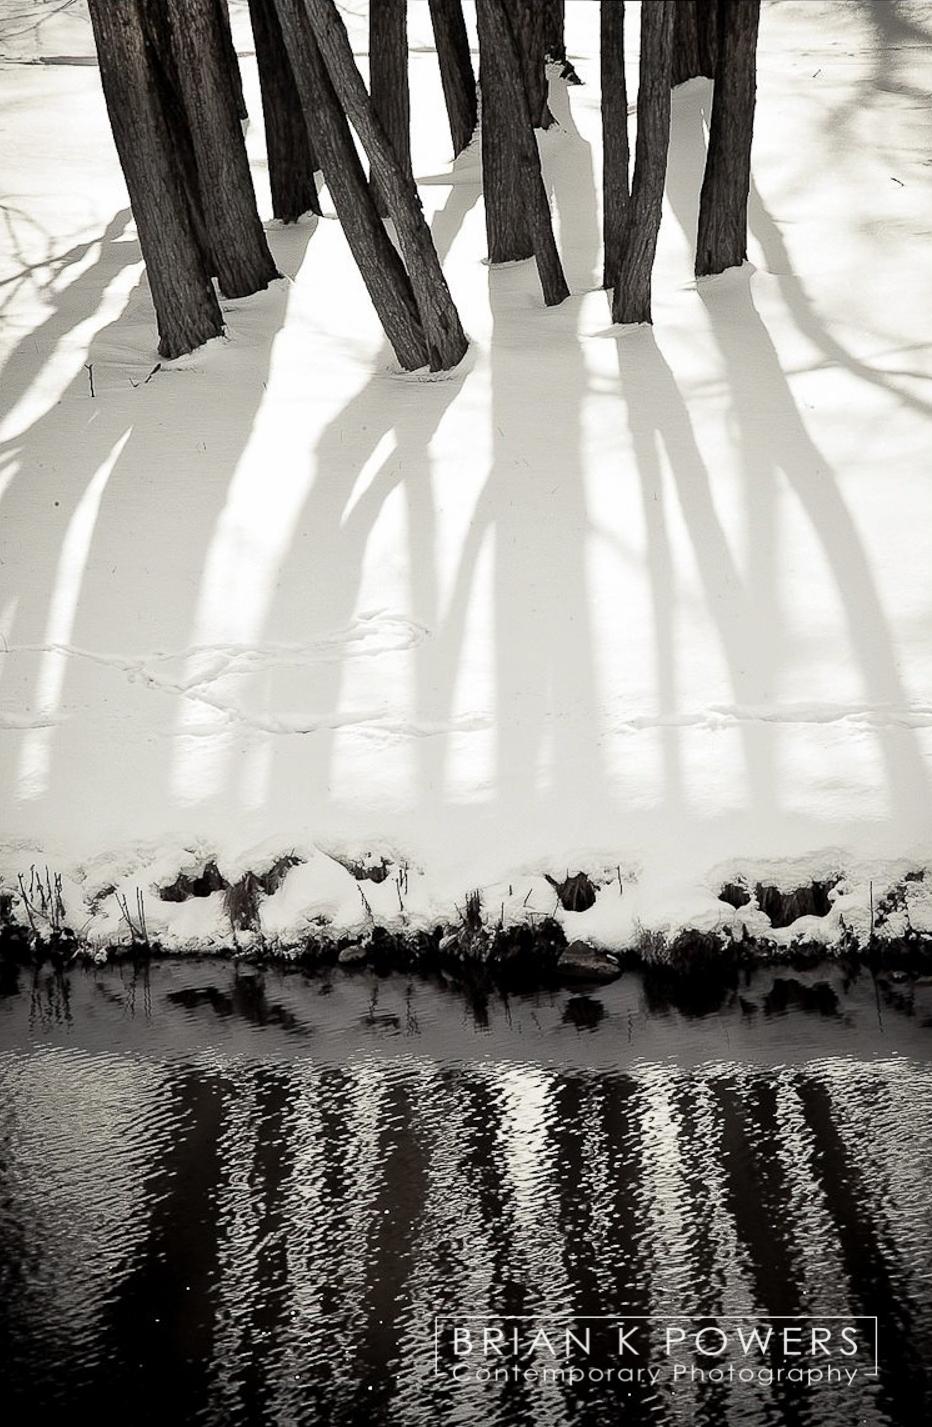 Ann_Arbor_Michigan_winter_trees_001